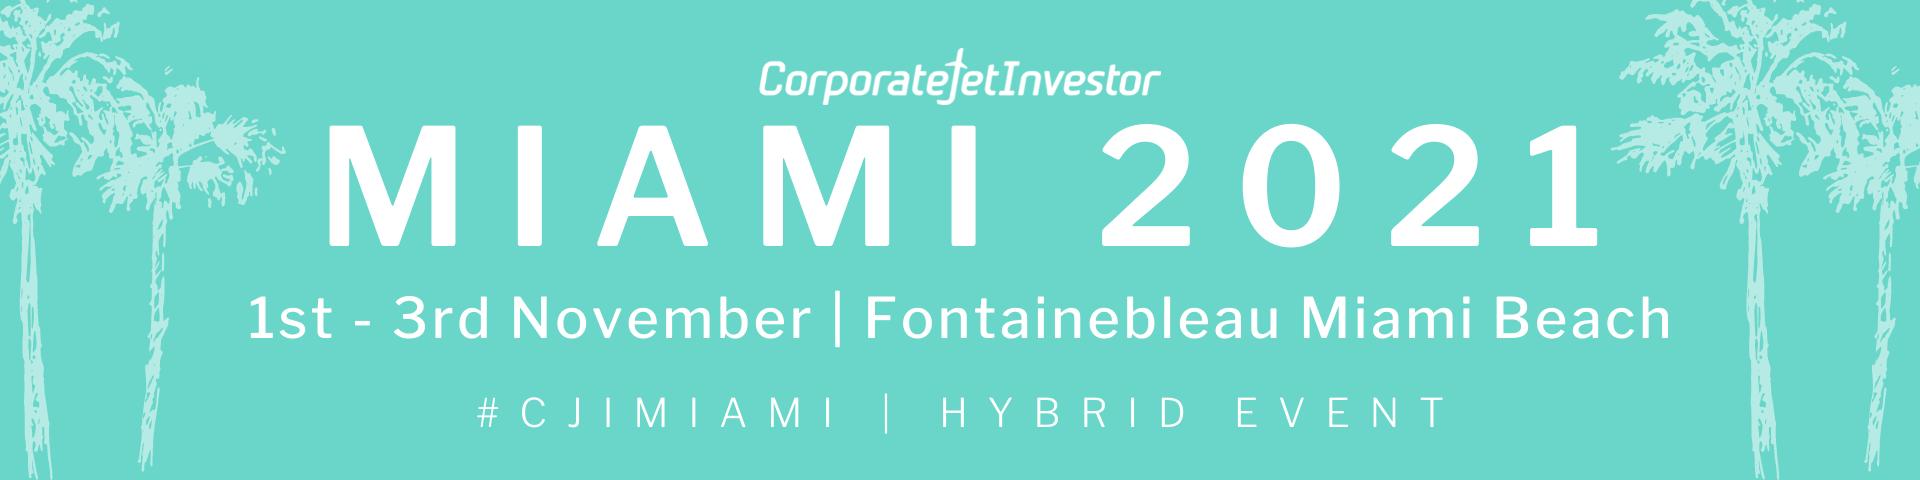 Corporate Jet Investor Miami 2021